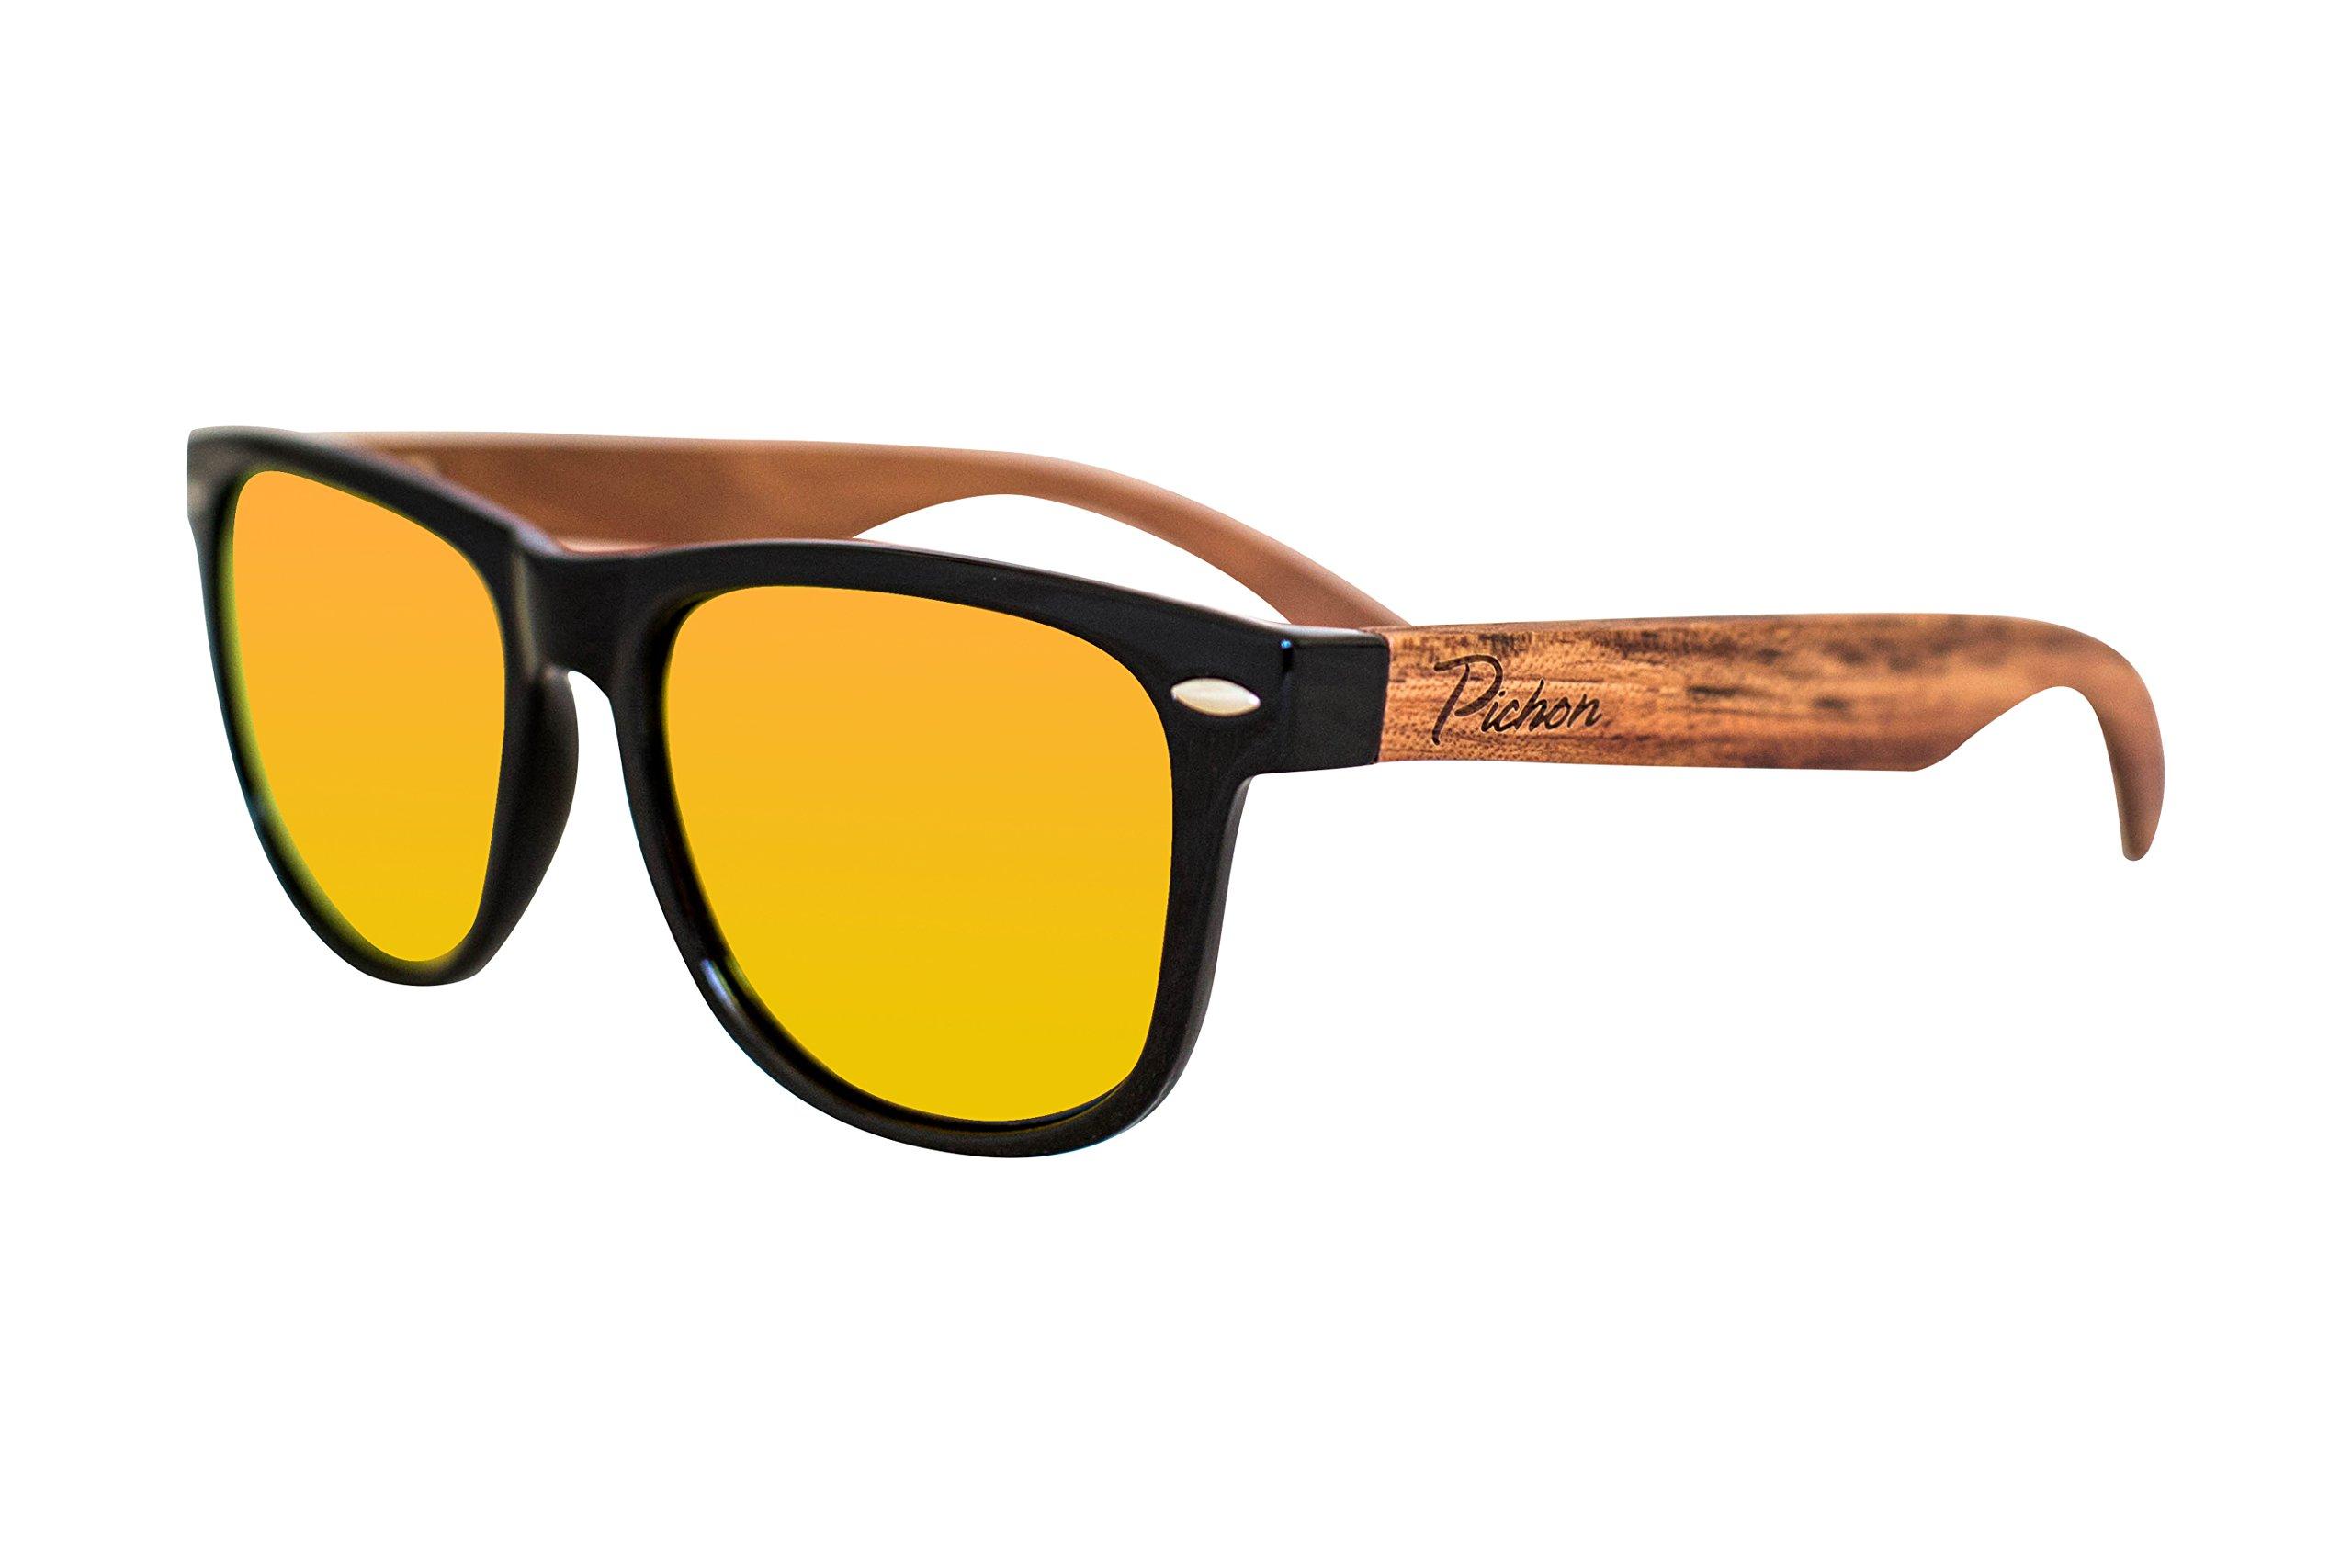 e33c51dea30 Pichon Designs 100% Bamboo Wood Wayfarer Sunglasses